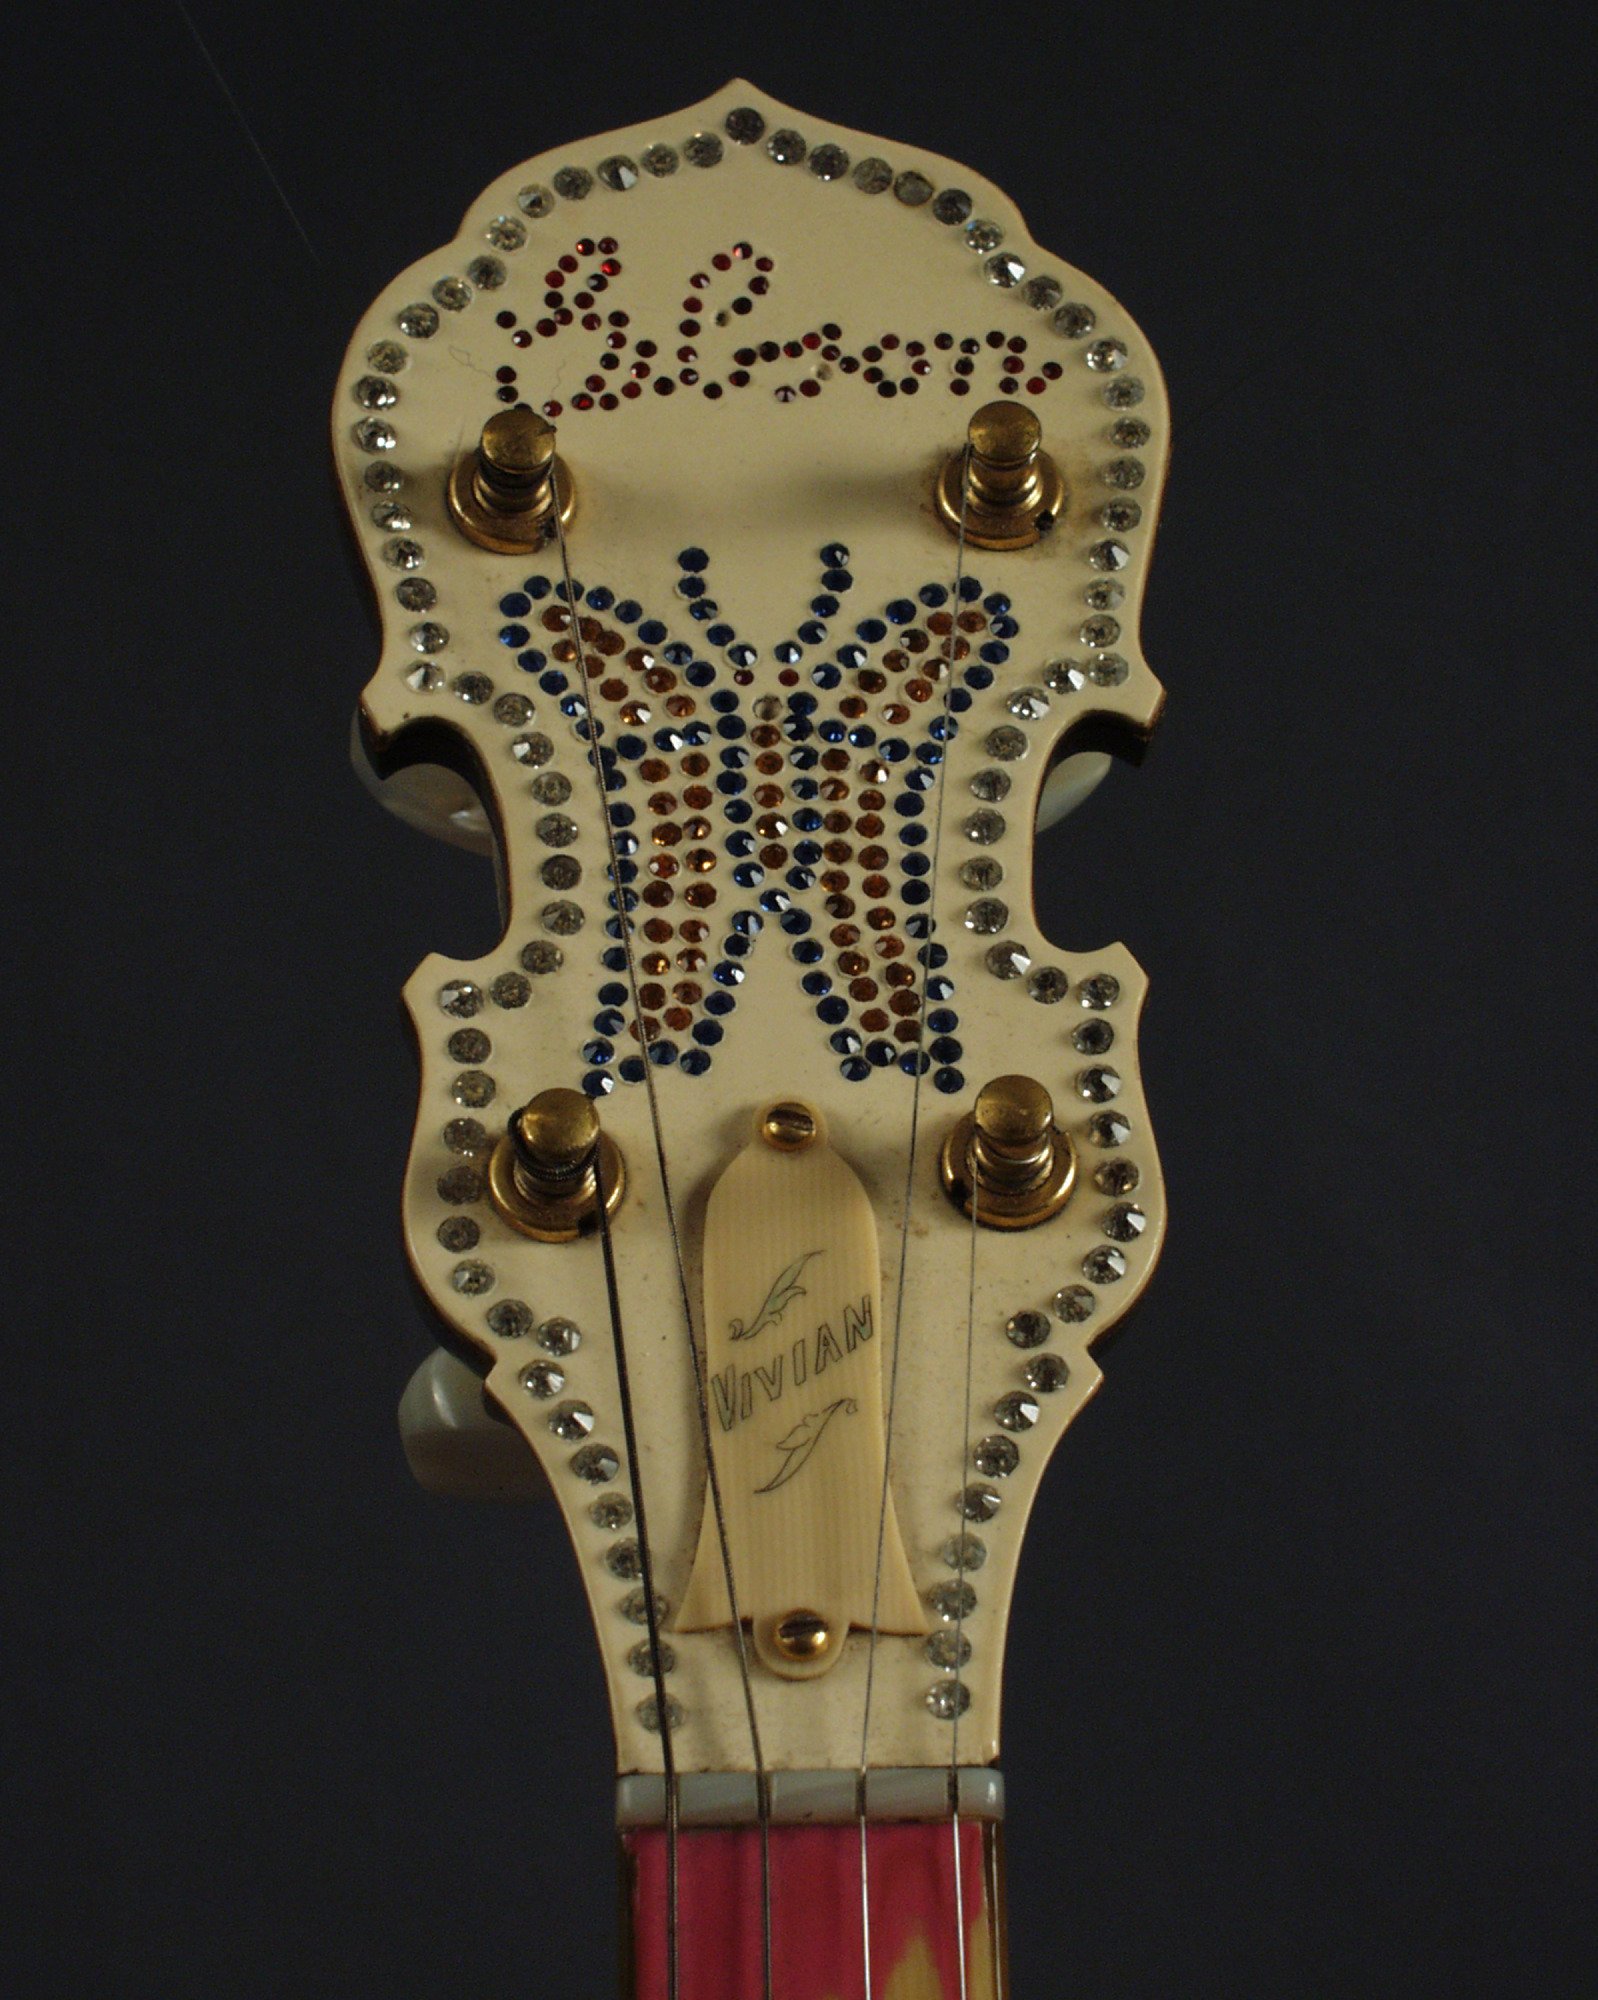 Vivian Hayes' Gibson Tenor Banjo - Image version 2